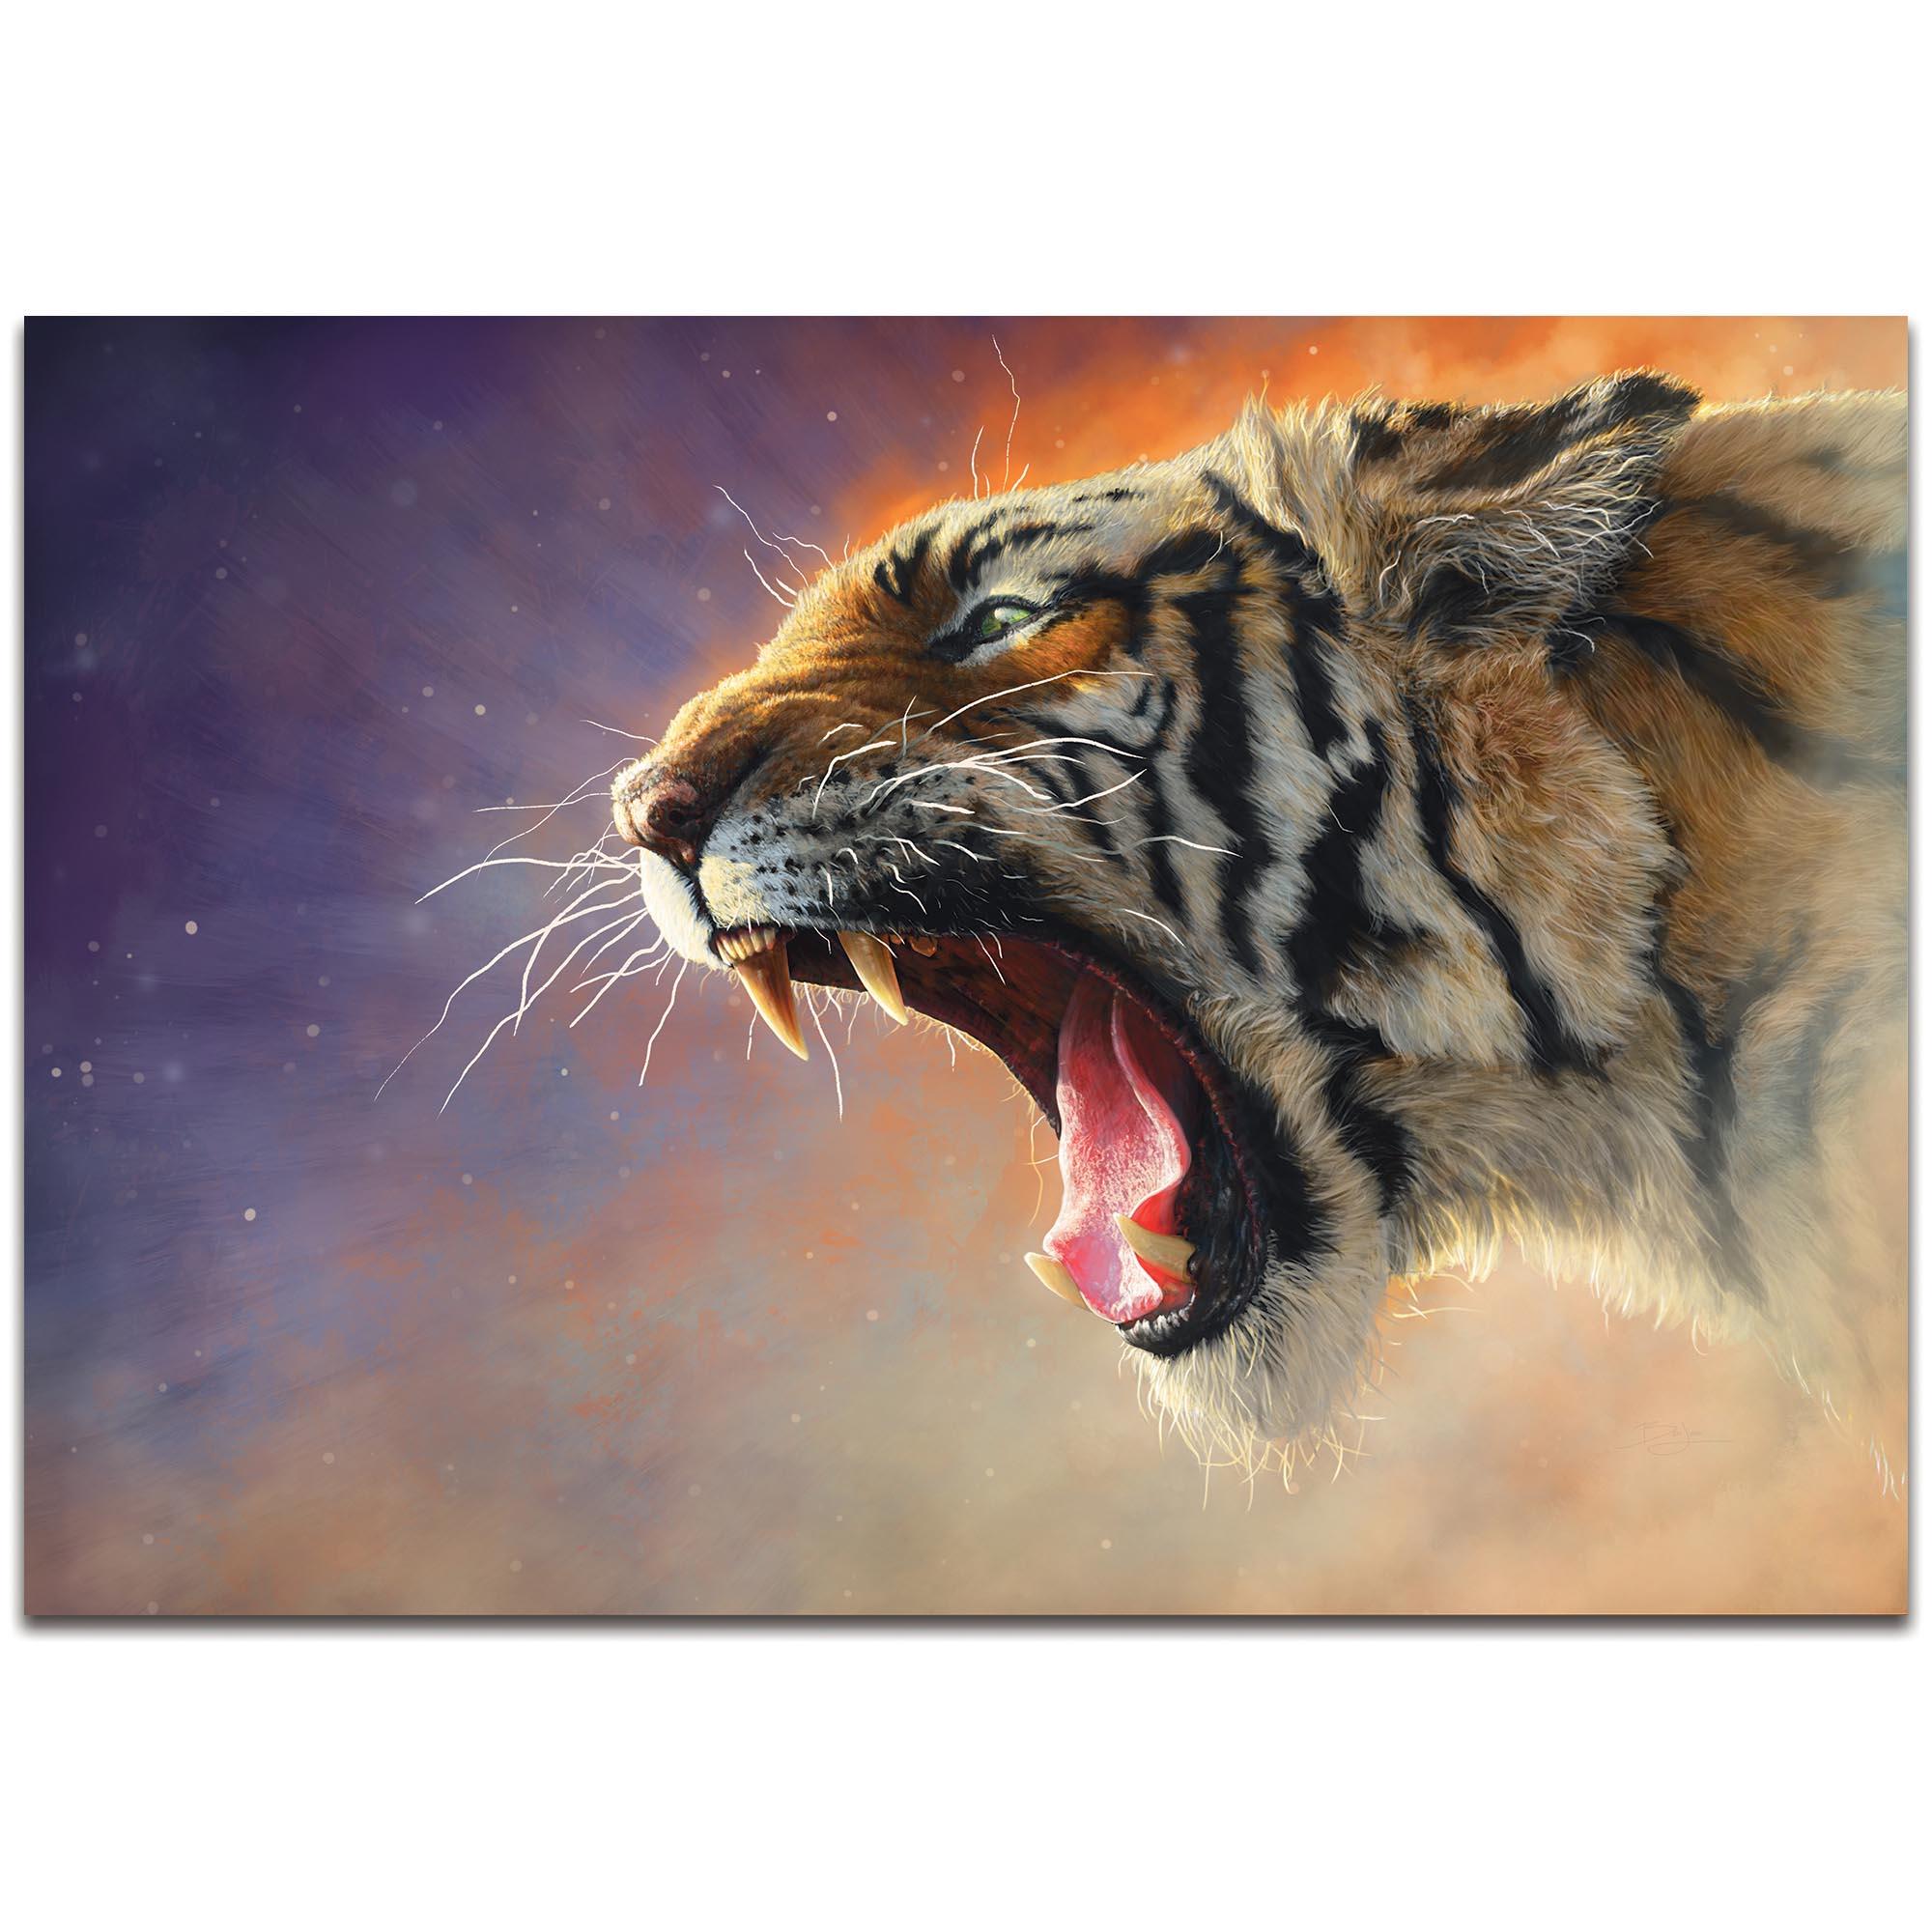 Expressionist Wall Art 'Fear Me' - Wildlife Decor on Metal or Plexiglass